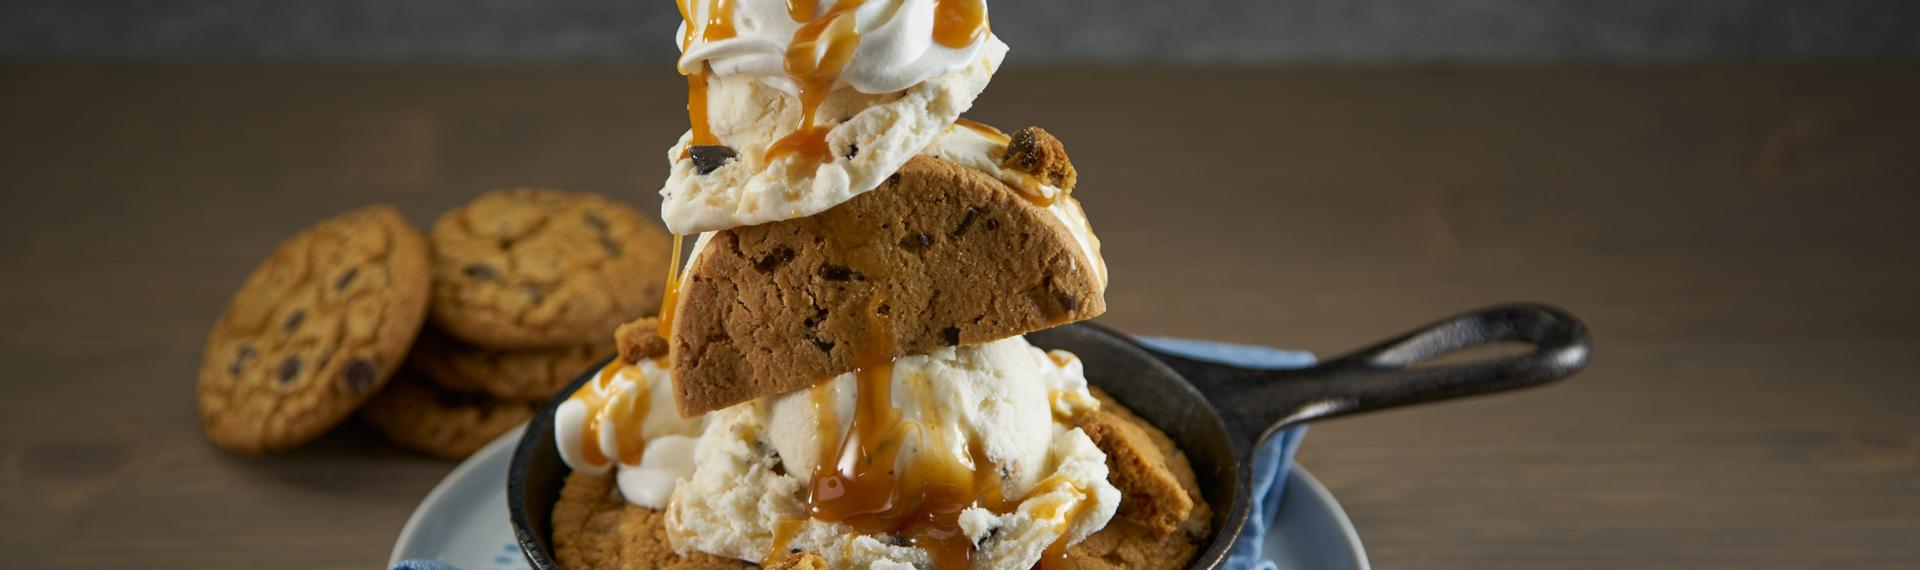 Cookie Dough Creation Sundae - Single Serve